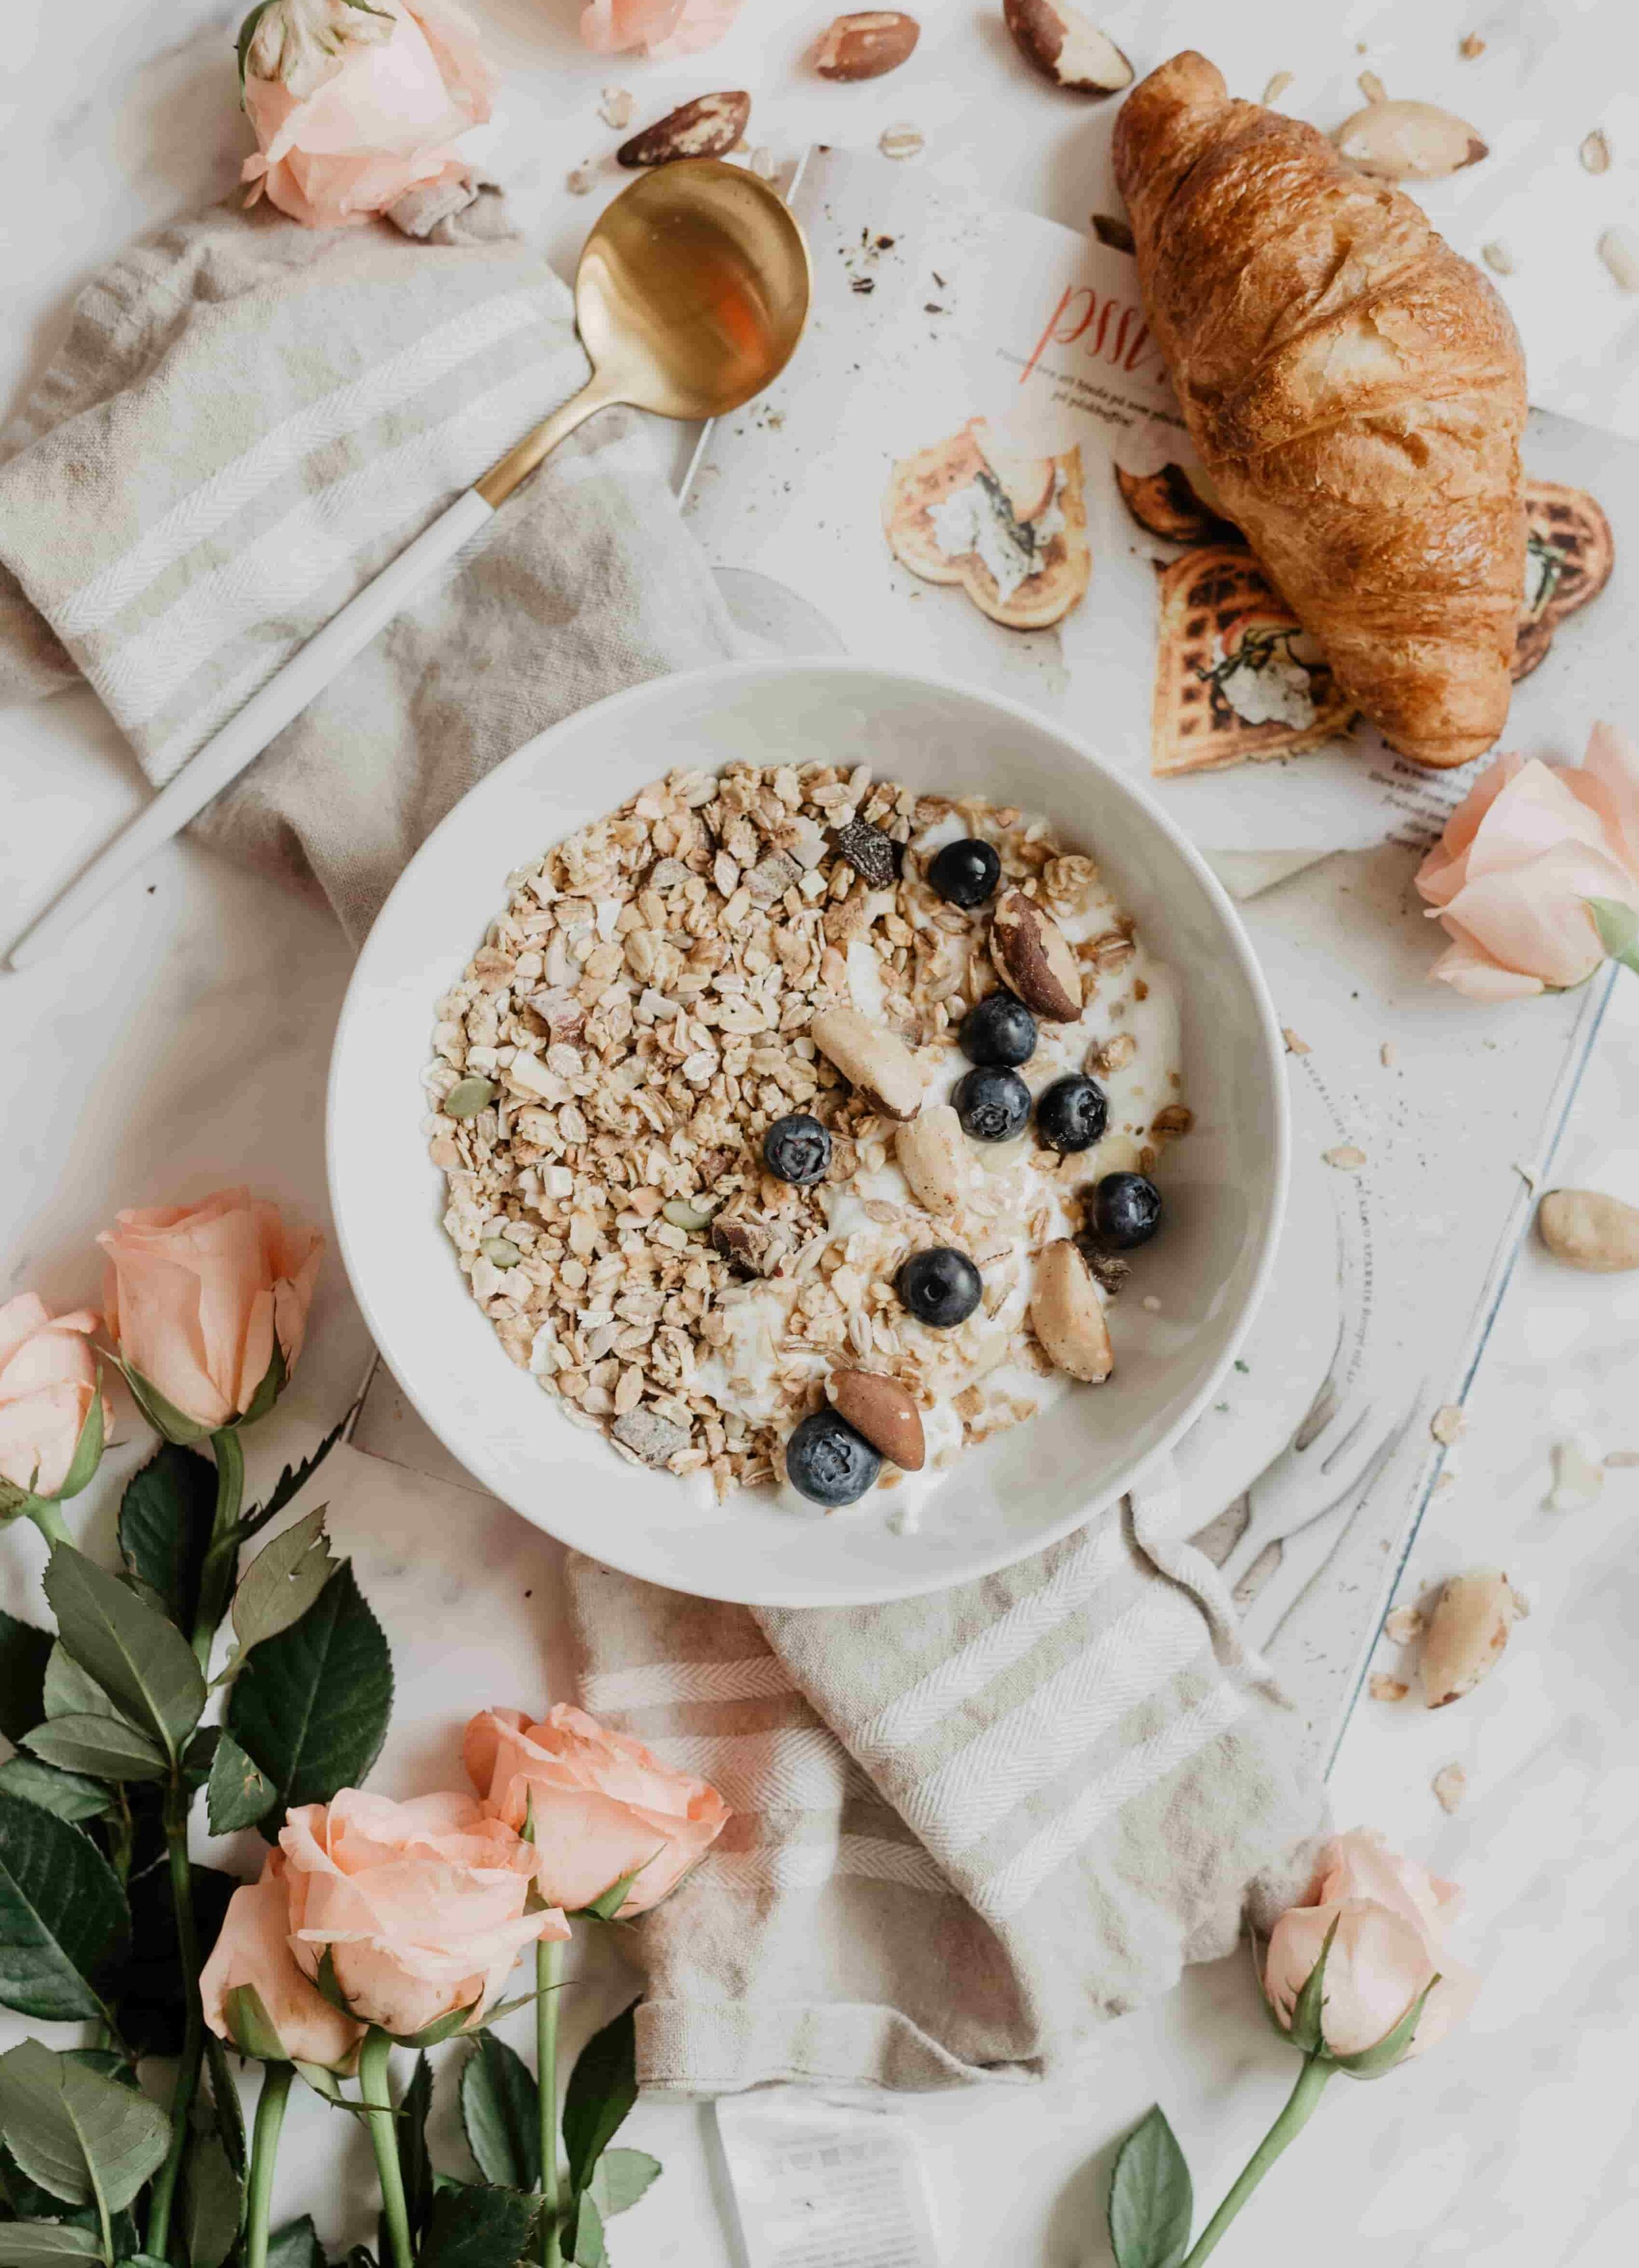 Make breakfast! 10 Tips for Staying Zero Waste at Work from www.goingzerowaste.com #zerowaste #ecofriendly #gogreen #sustainable #work #workplace #office